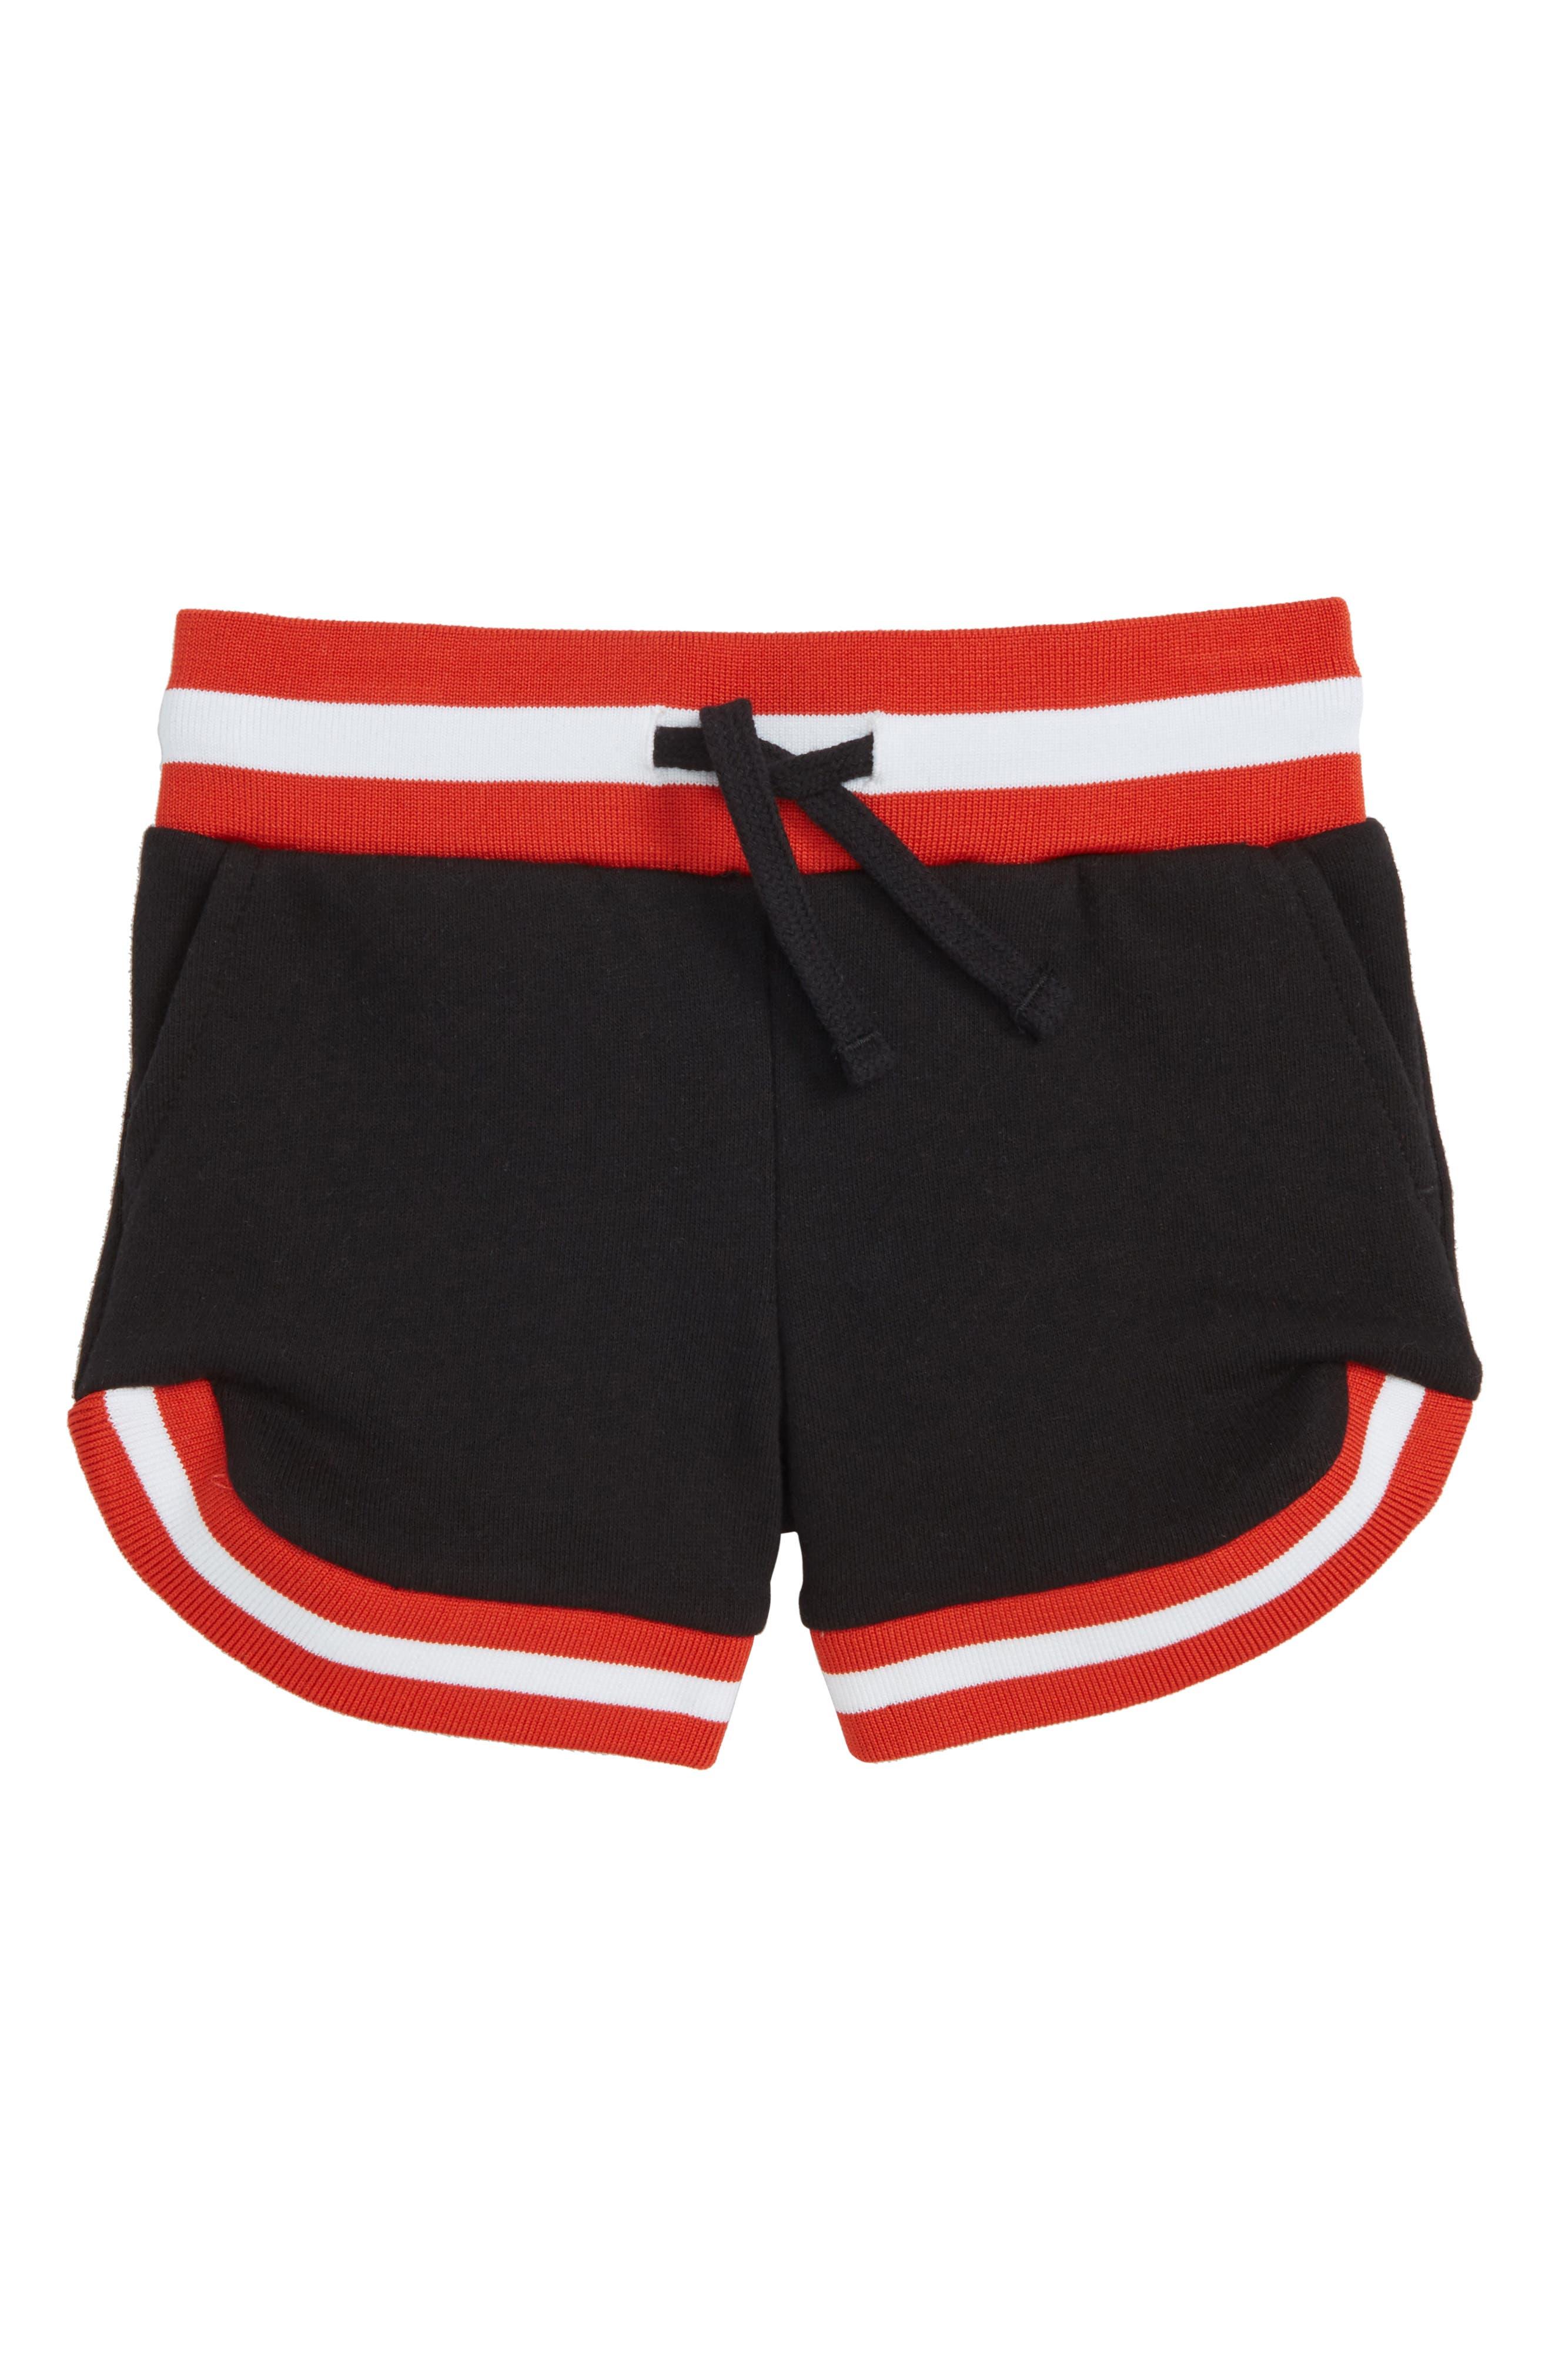 Delilah Shorts,                             Main thumbnail 1, color,                             Black